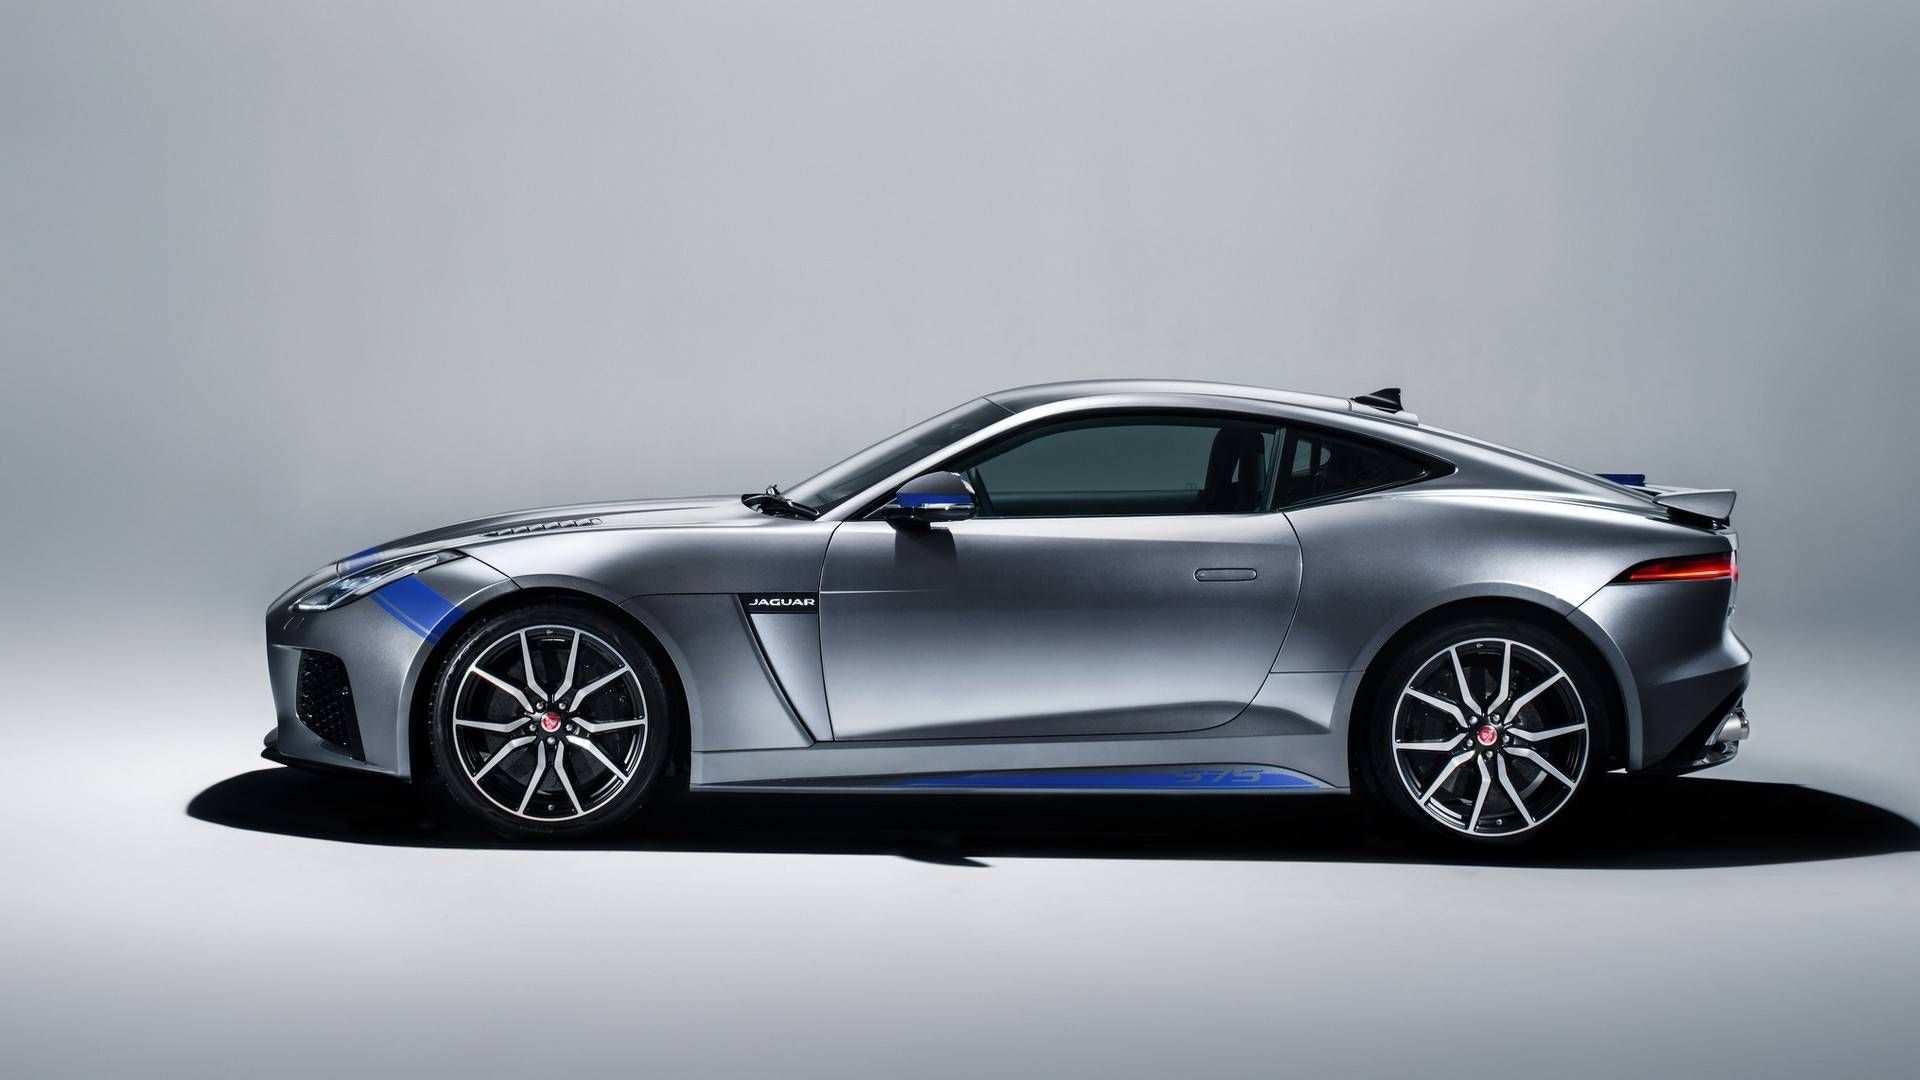 2020 Jaguar Xq Crossover Rumors